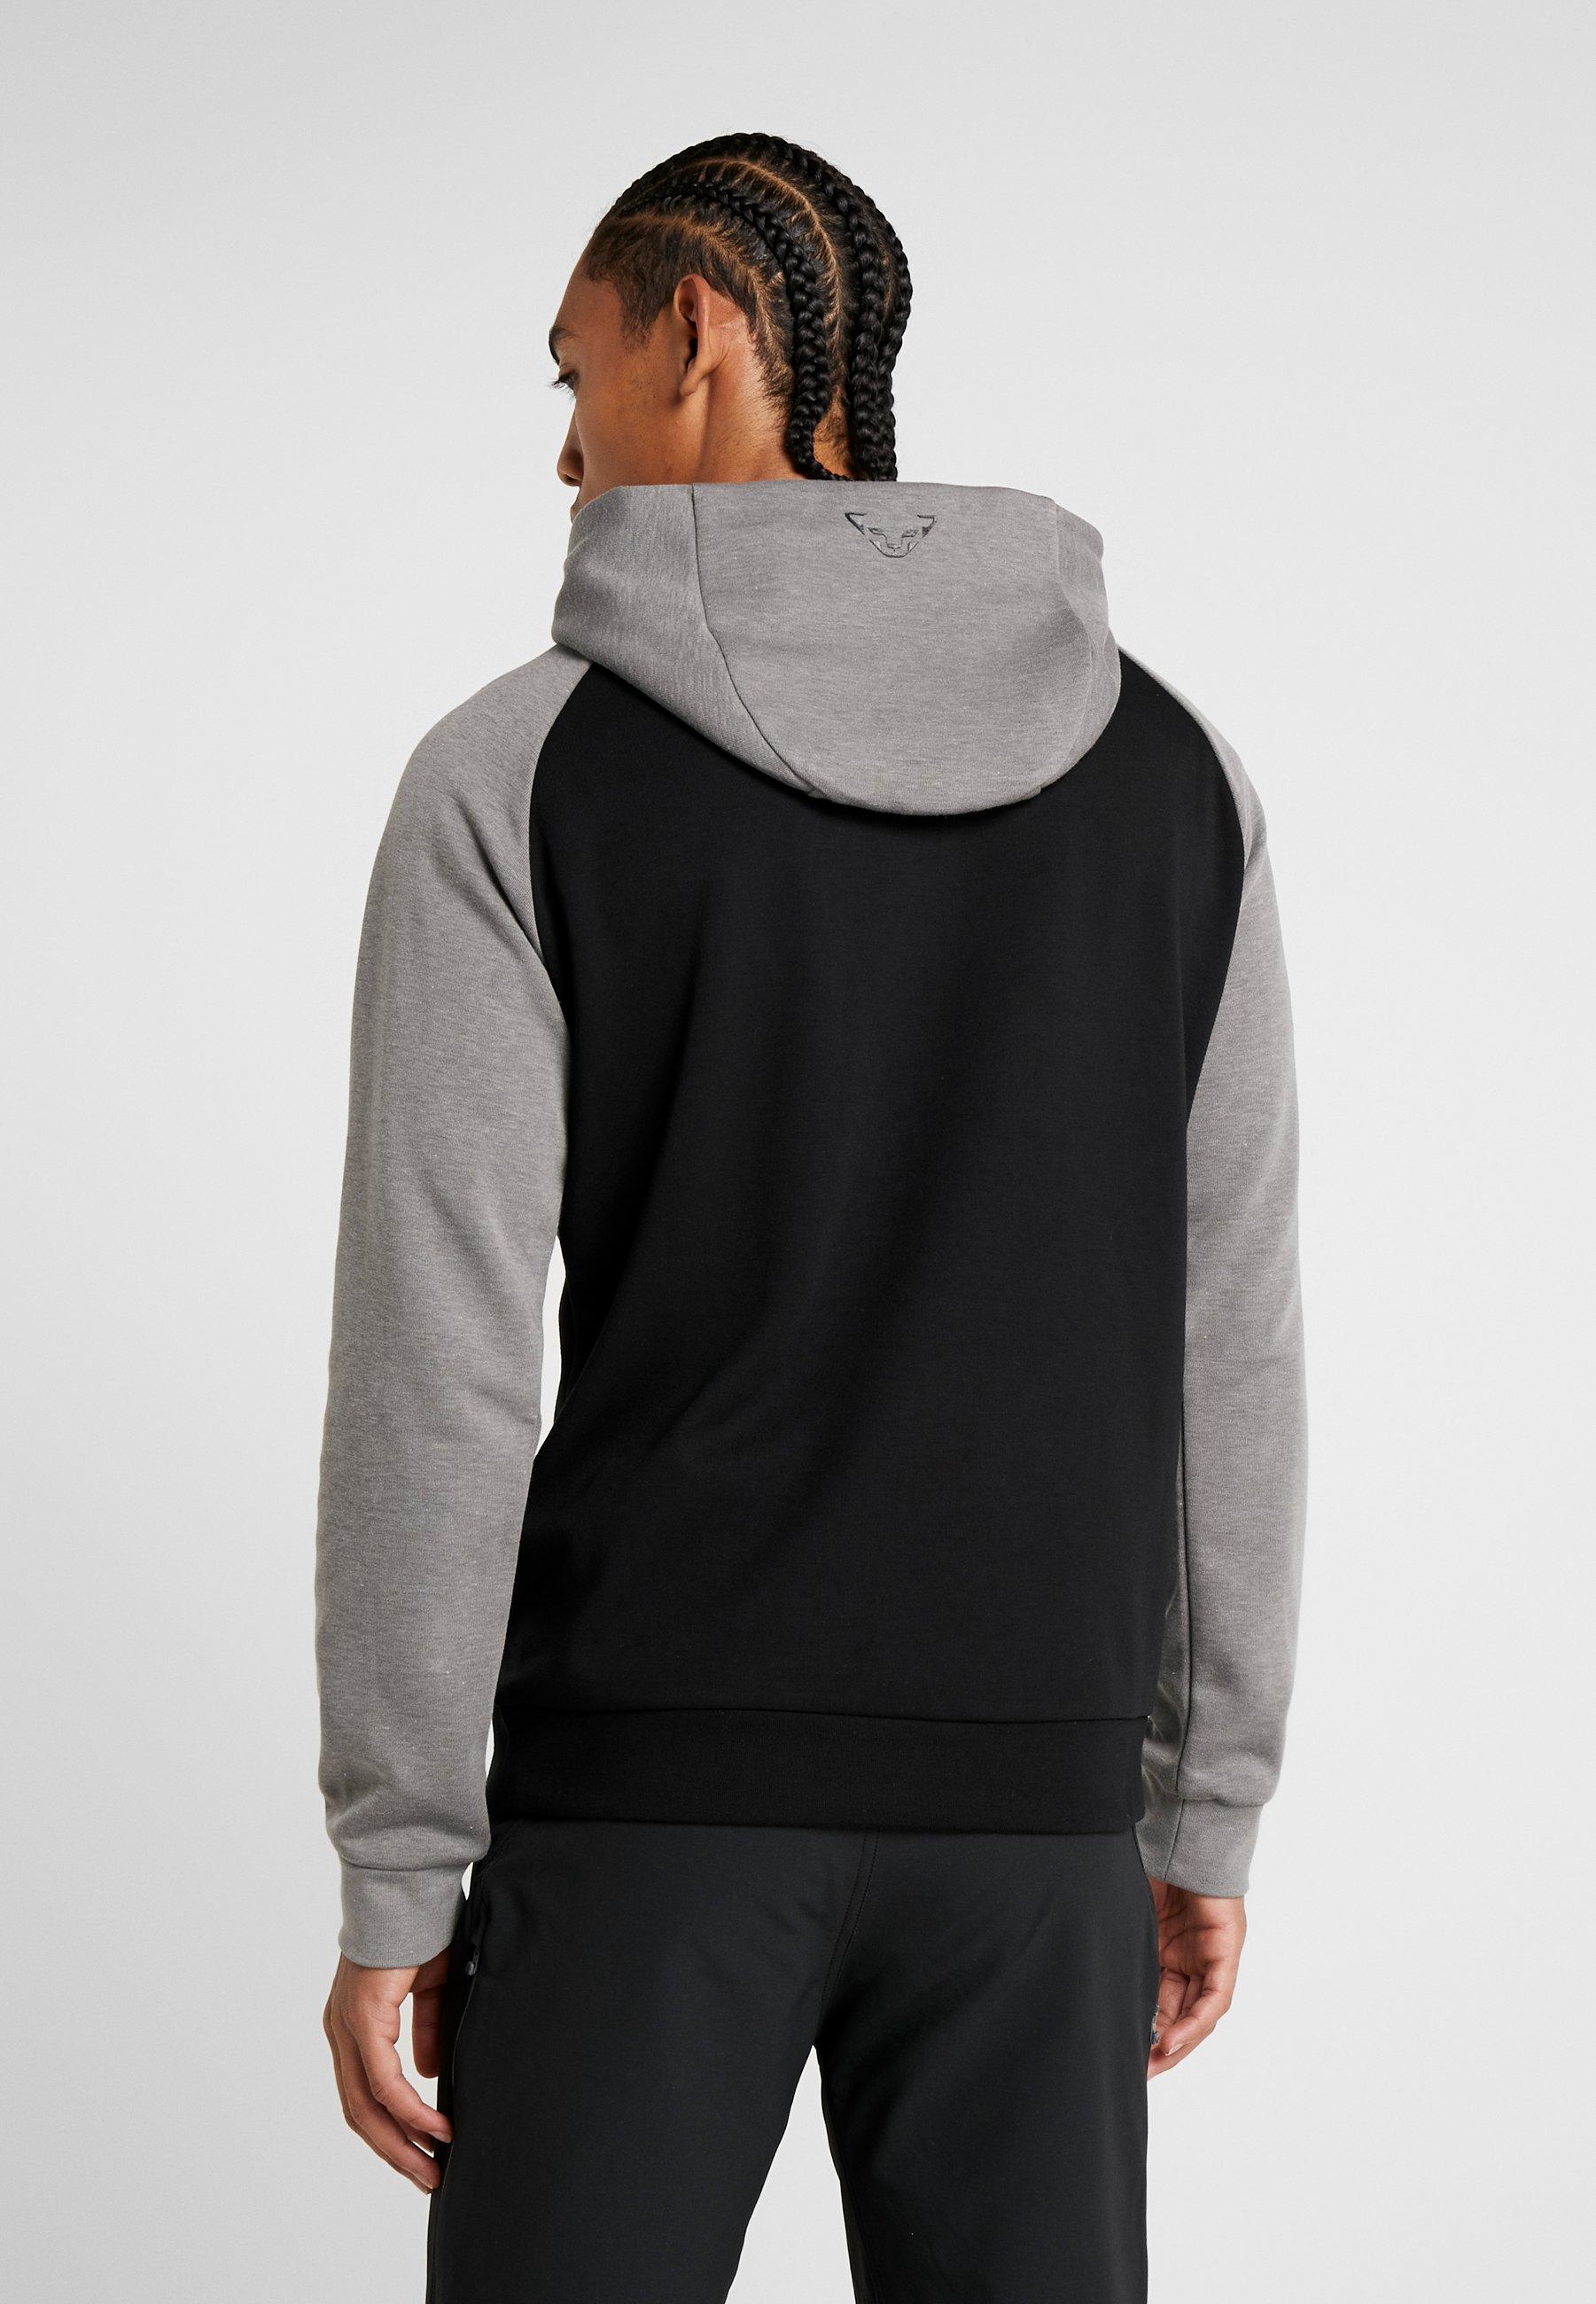 Dynafit Mercury Pro Mens Jacket, Poseidon Softshelljakker